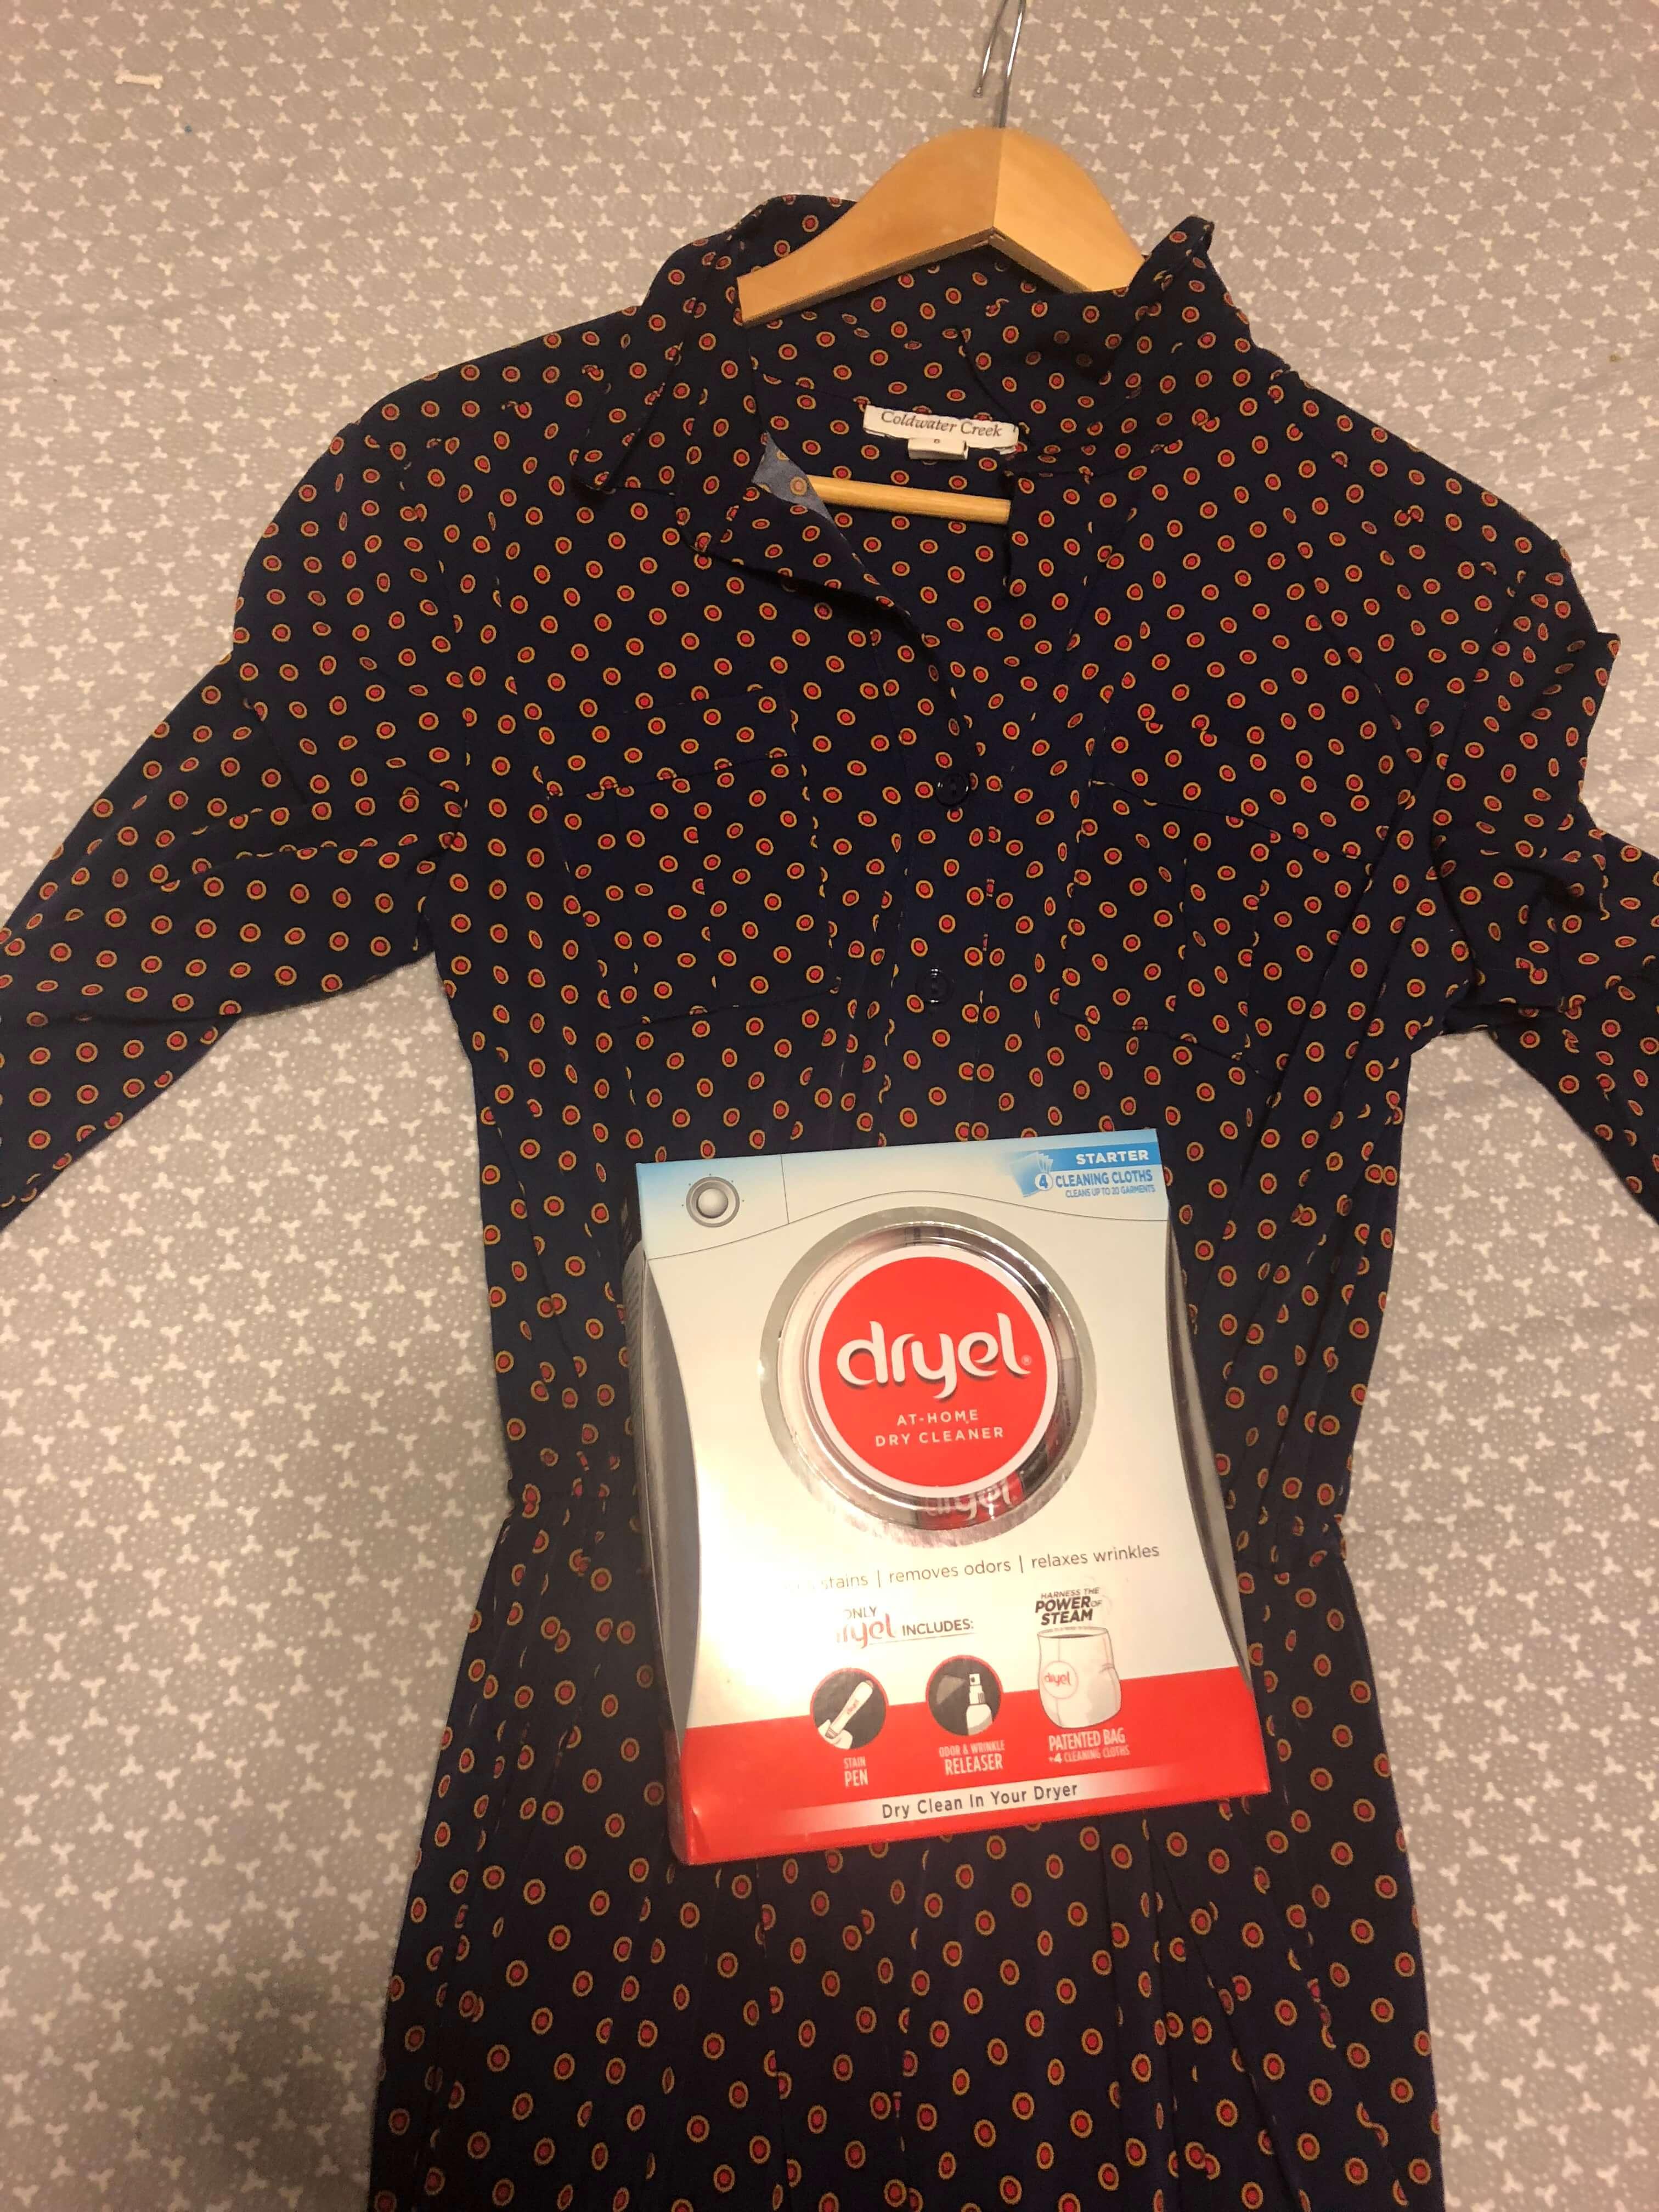 Fall Essentials I'm Loving dress cleaning by dryel